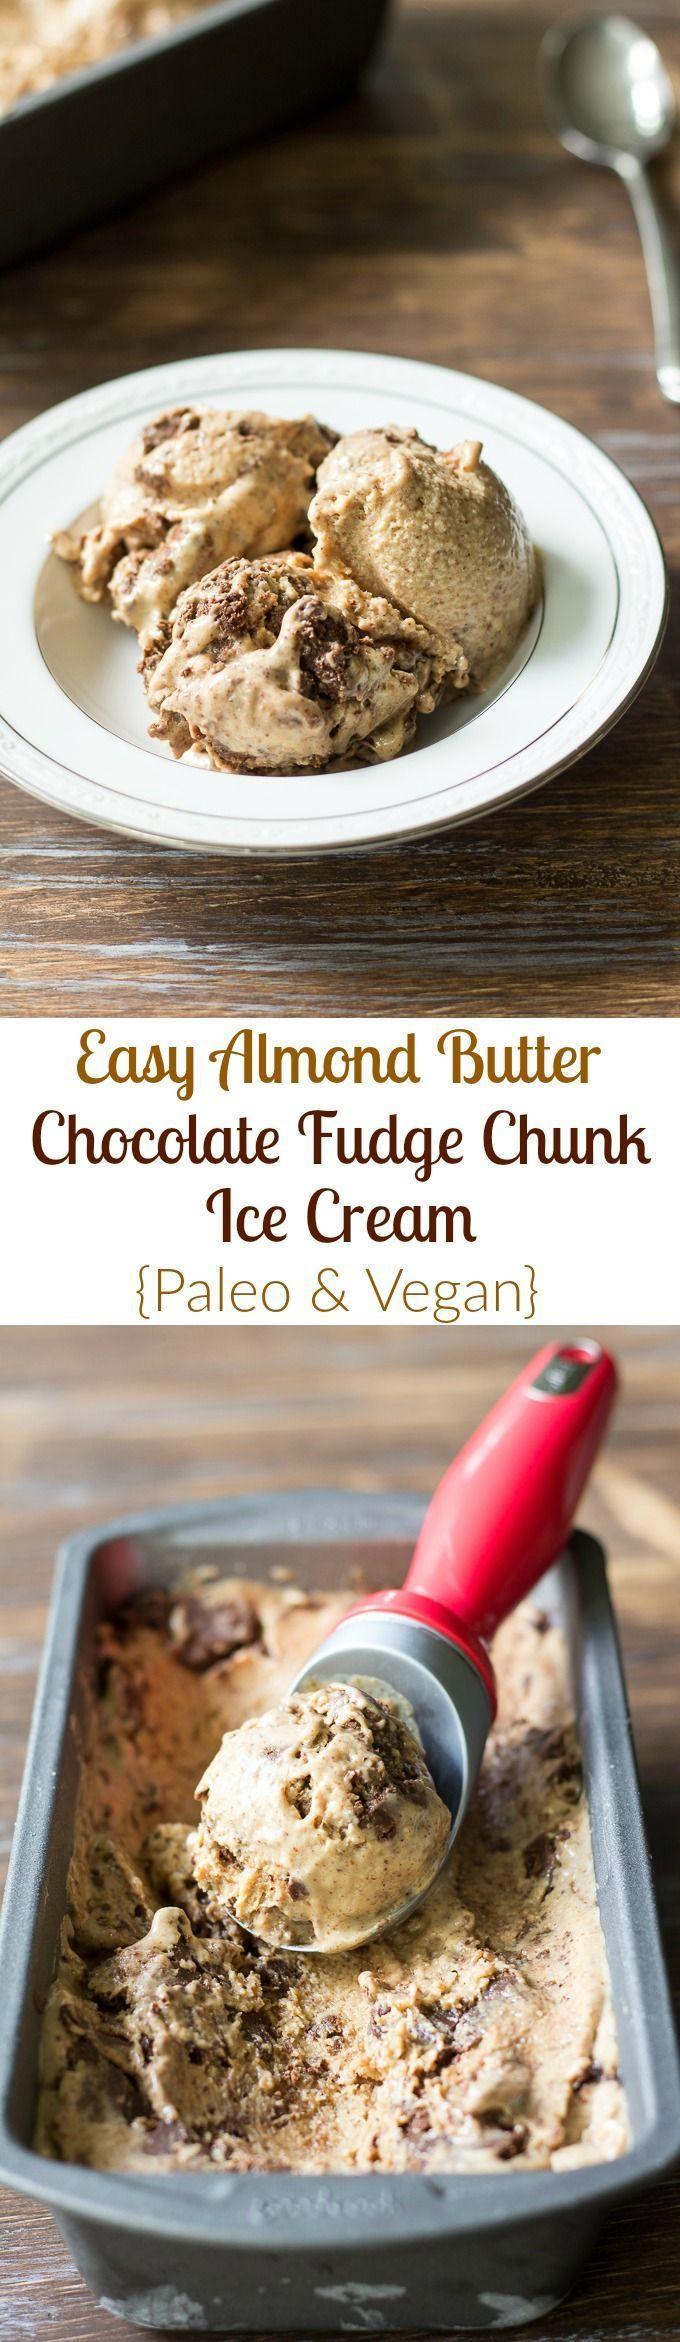 Almond Butter Chocolate Fudge Chunk Ice Cream (Paleo & Vegan)